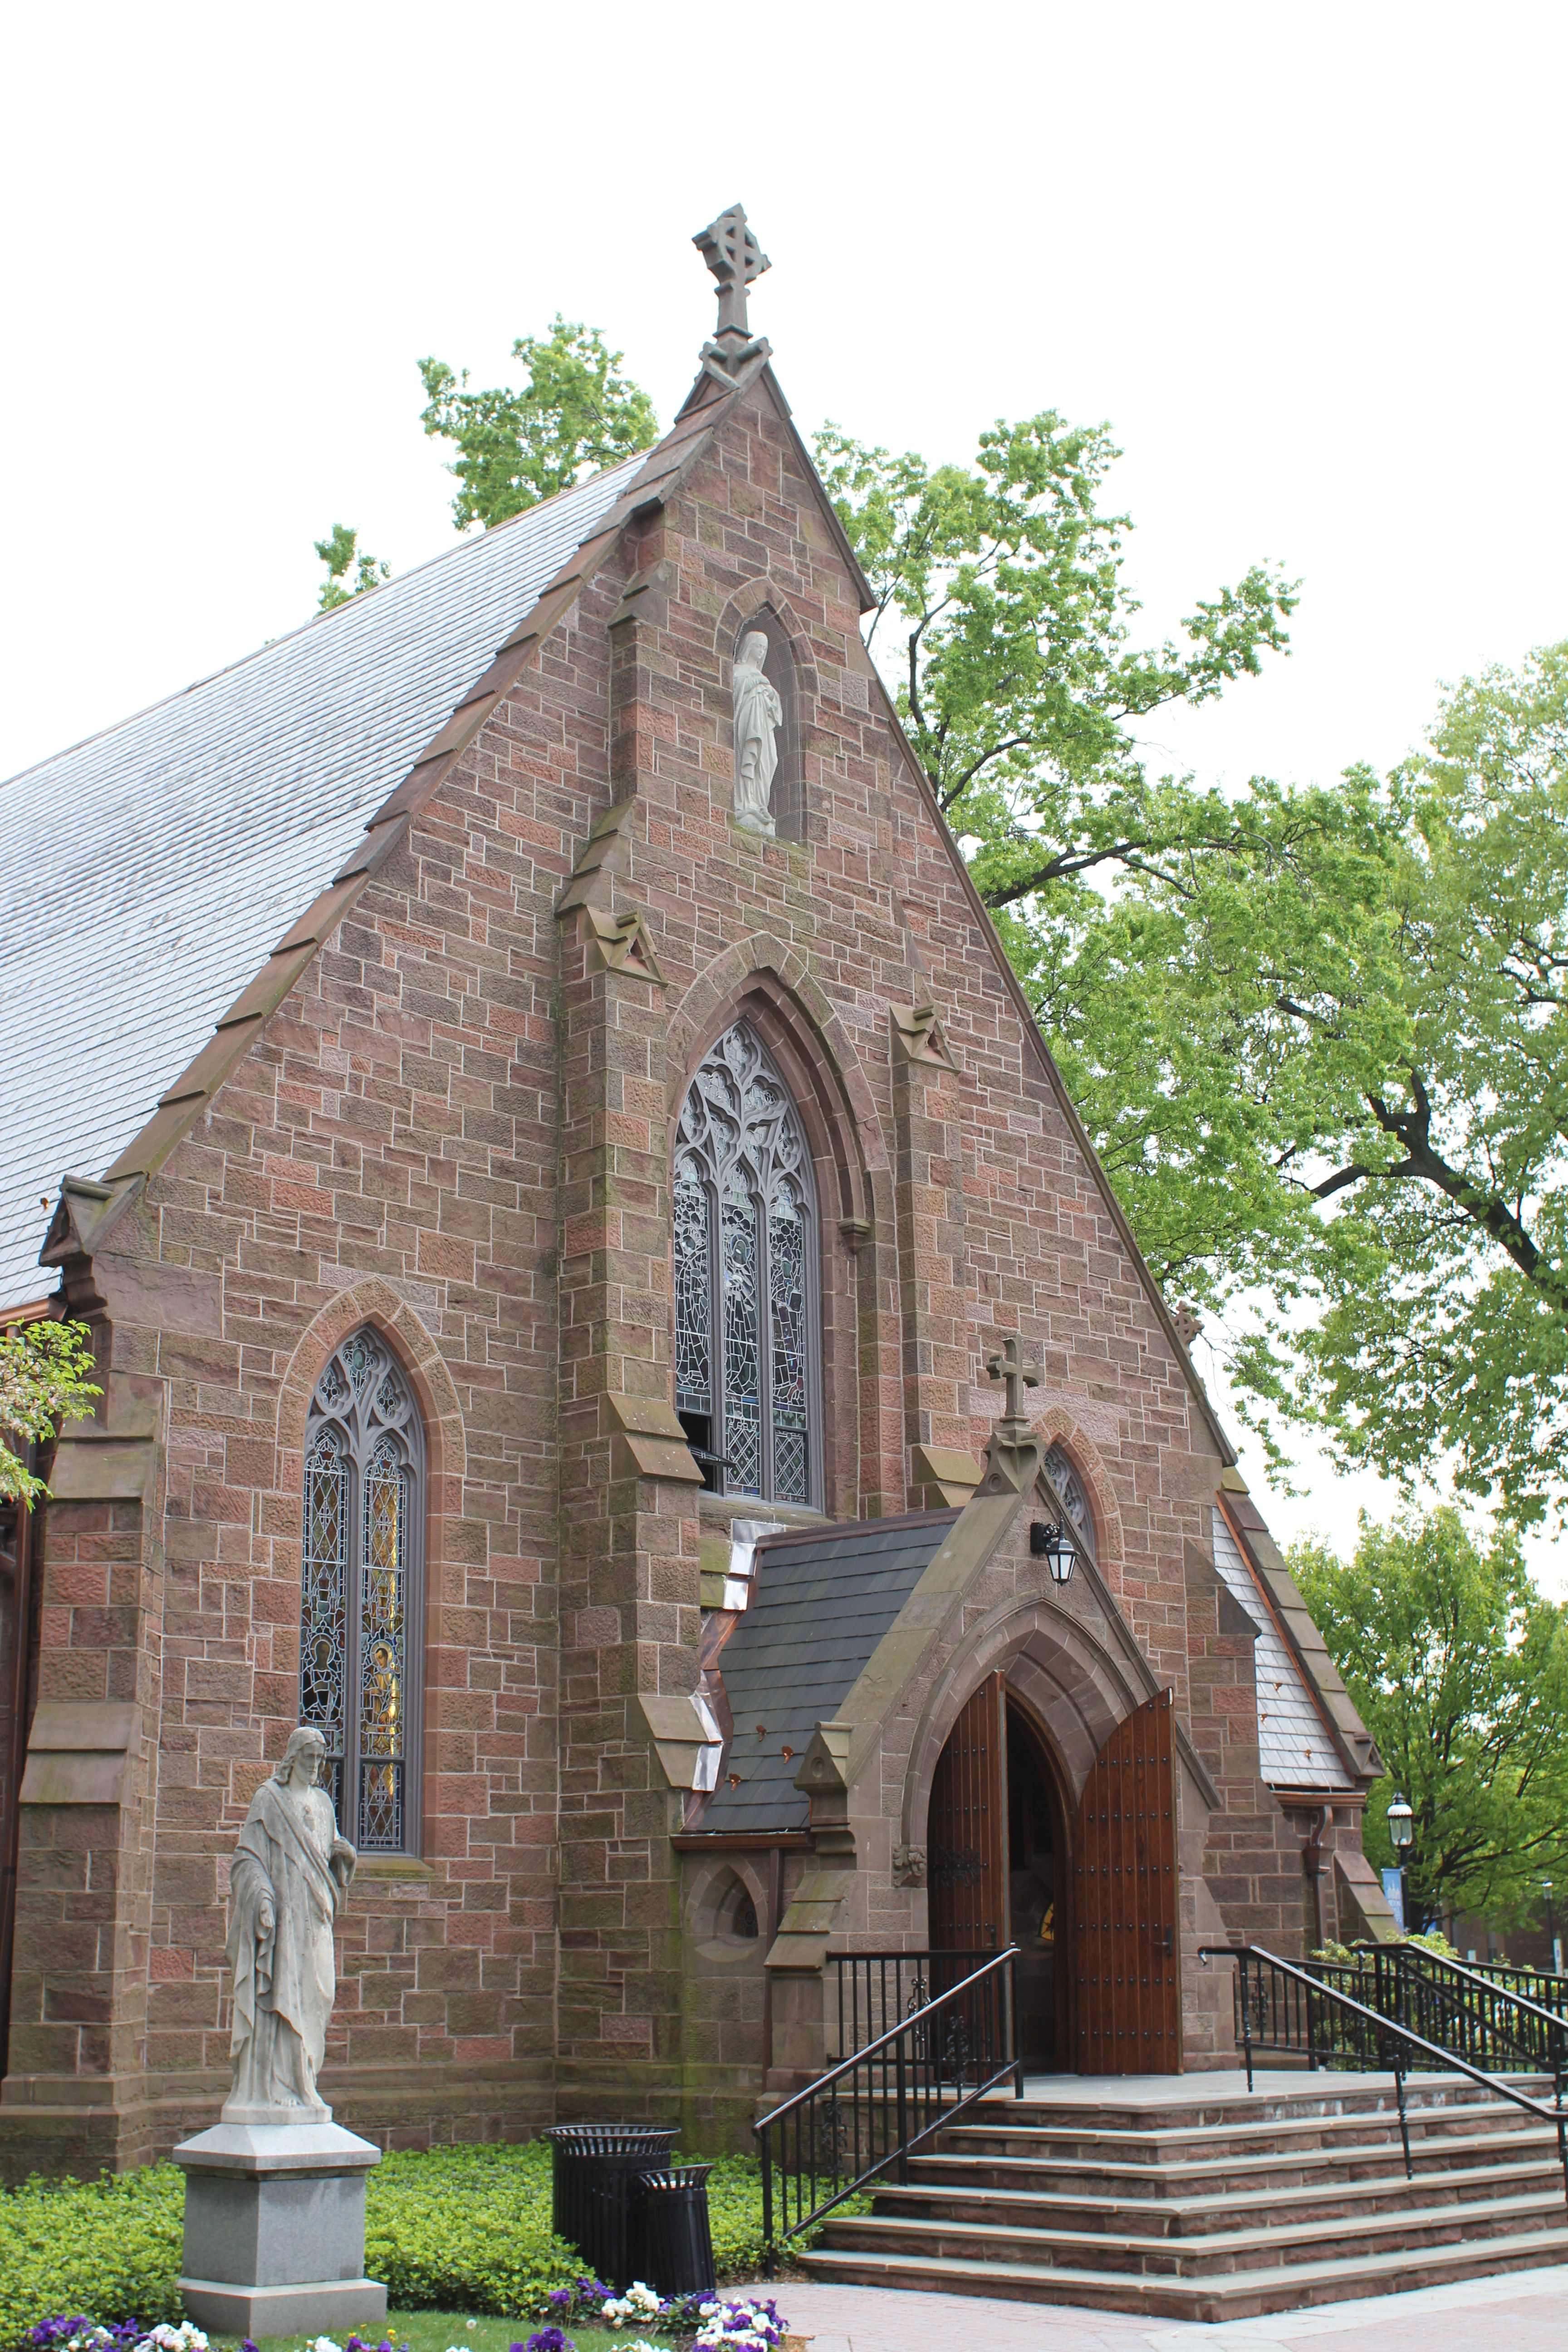 Pin By Jrc Xtaldi On Churches Seton Hall University Dream School Chapel